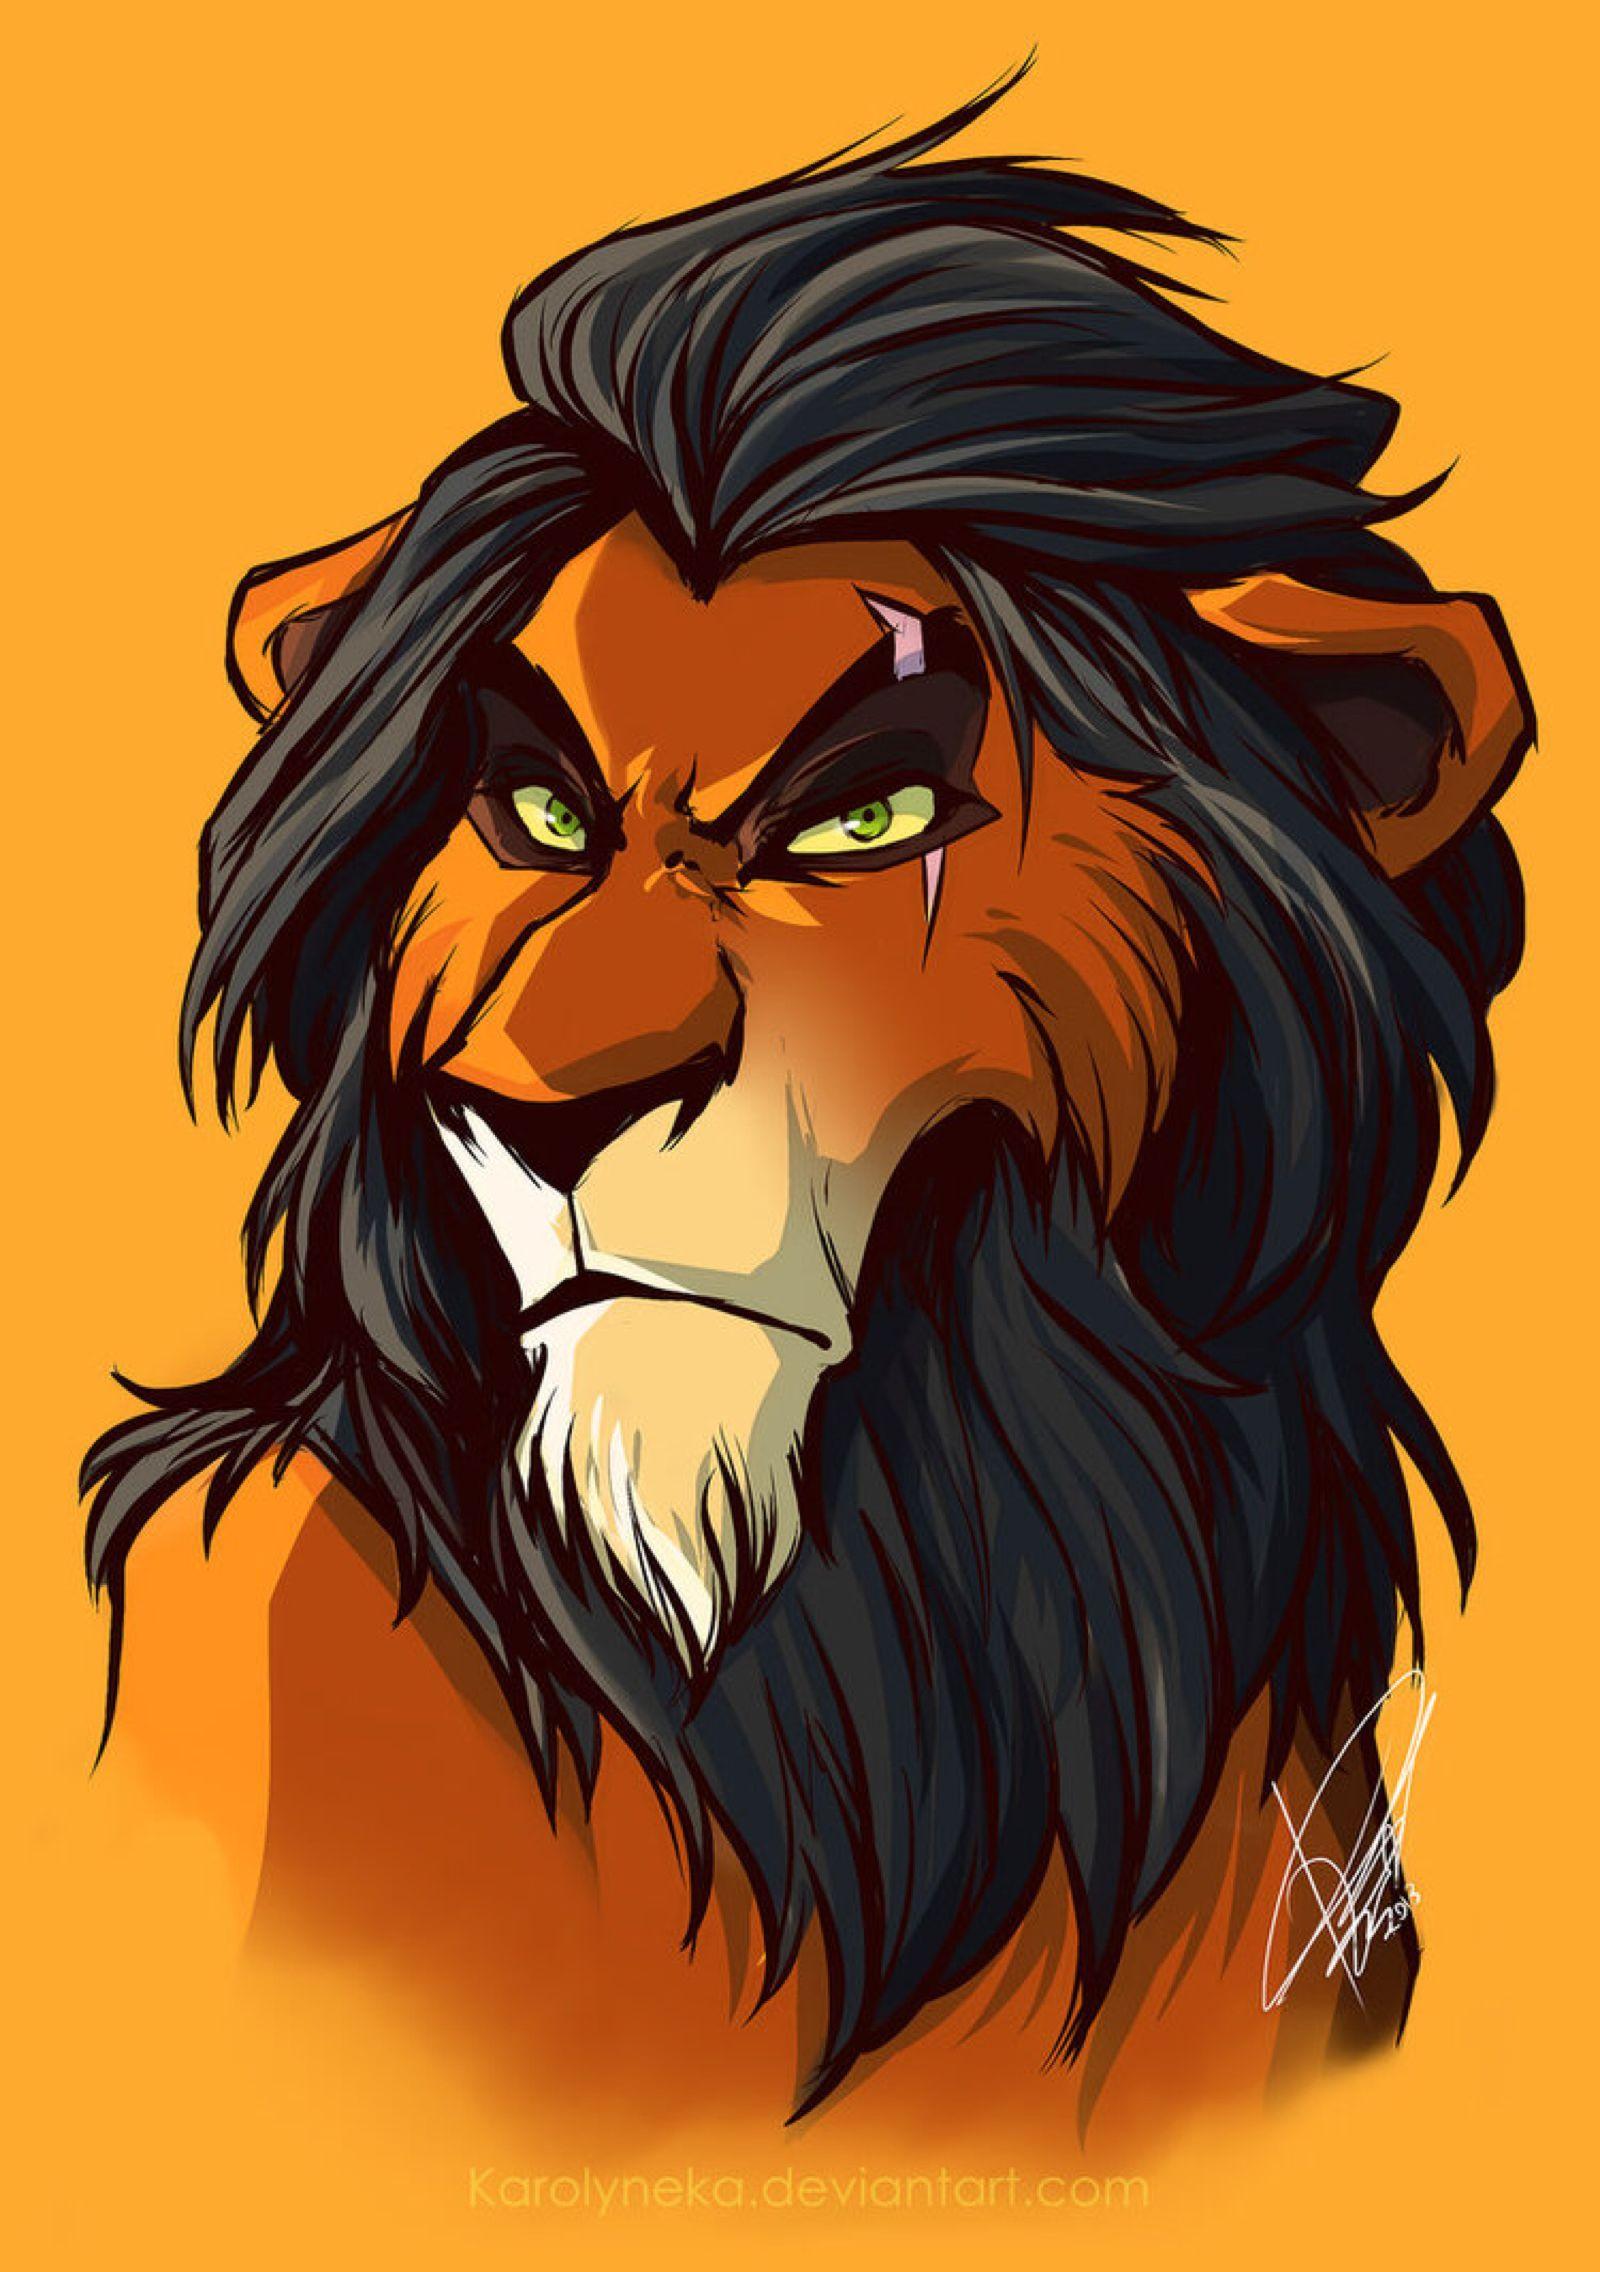 Scar by Karolykan on @DeviantArt | Disney | Pinterest | El rey leon ...